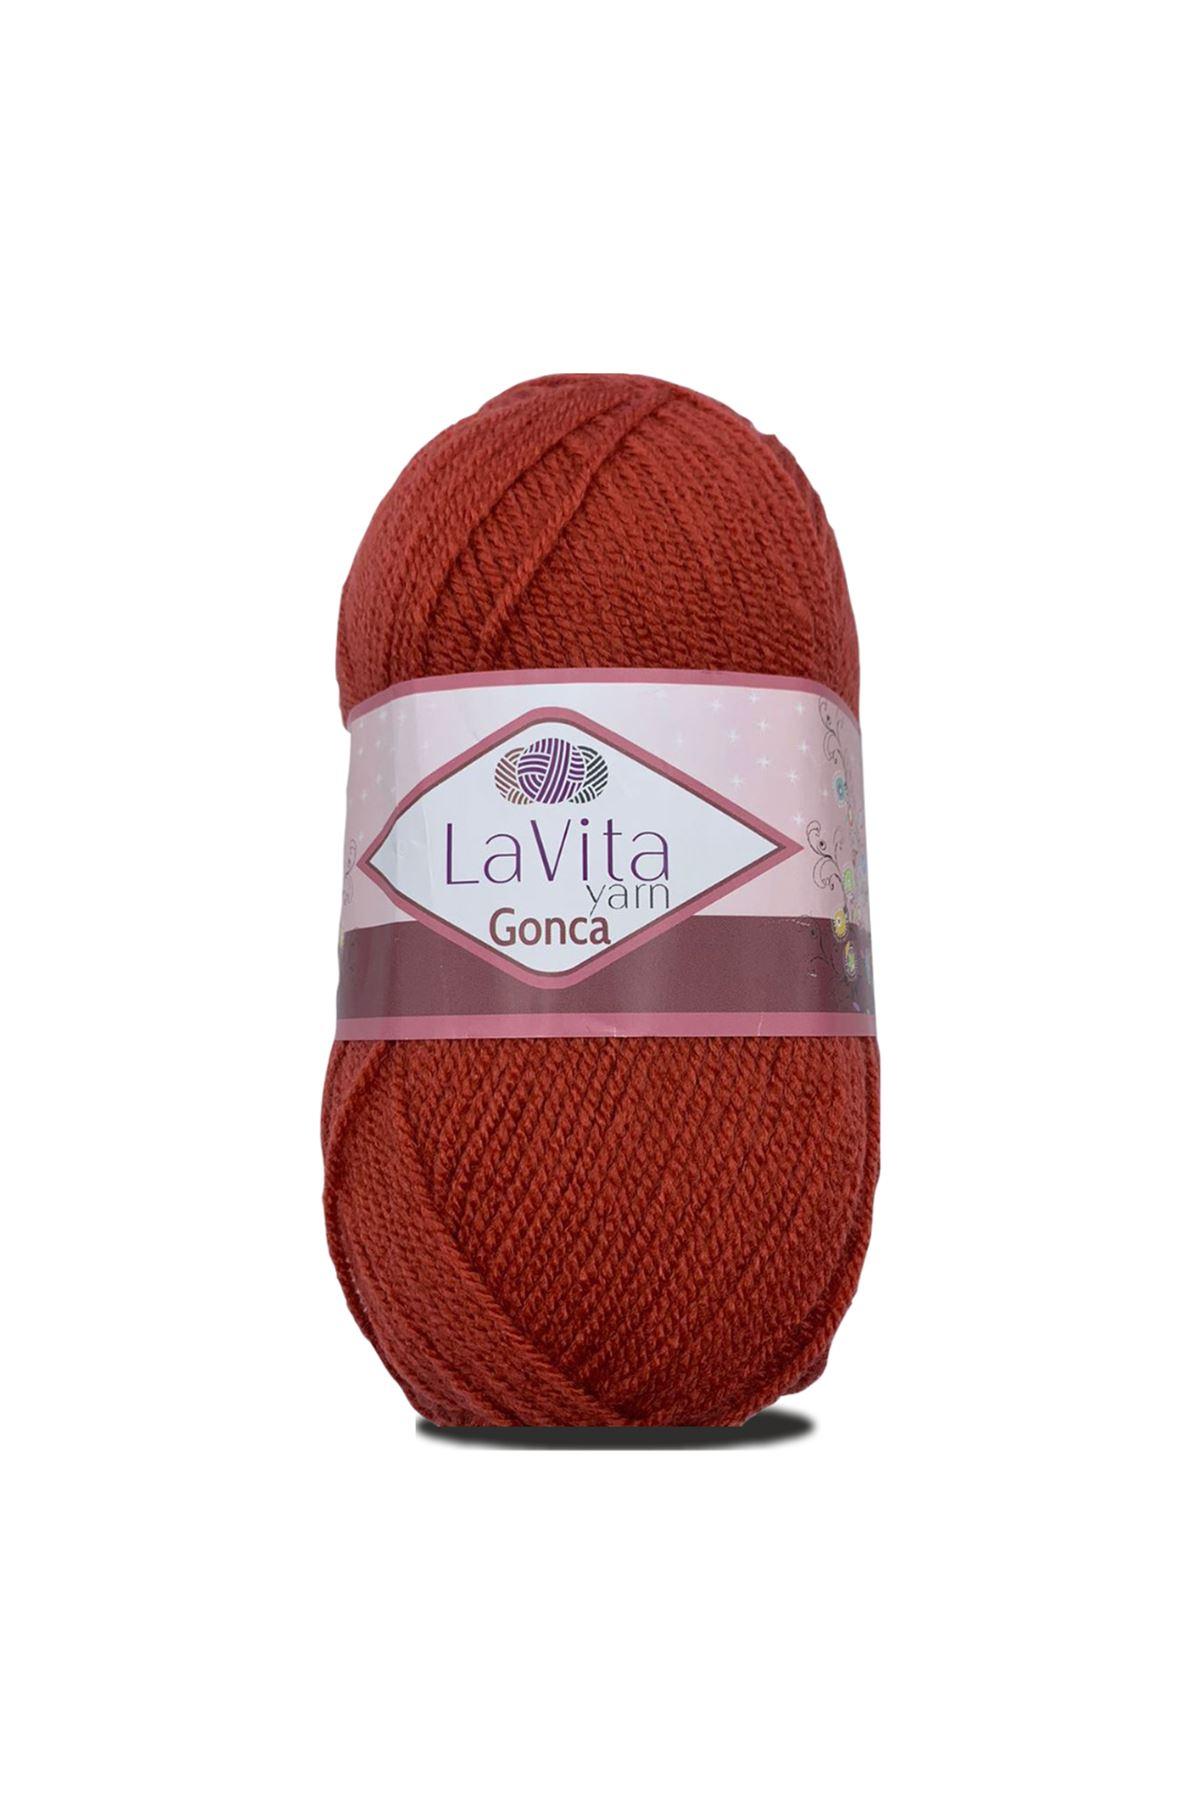 Lavita Gonca 059 Soğan Kabuğu